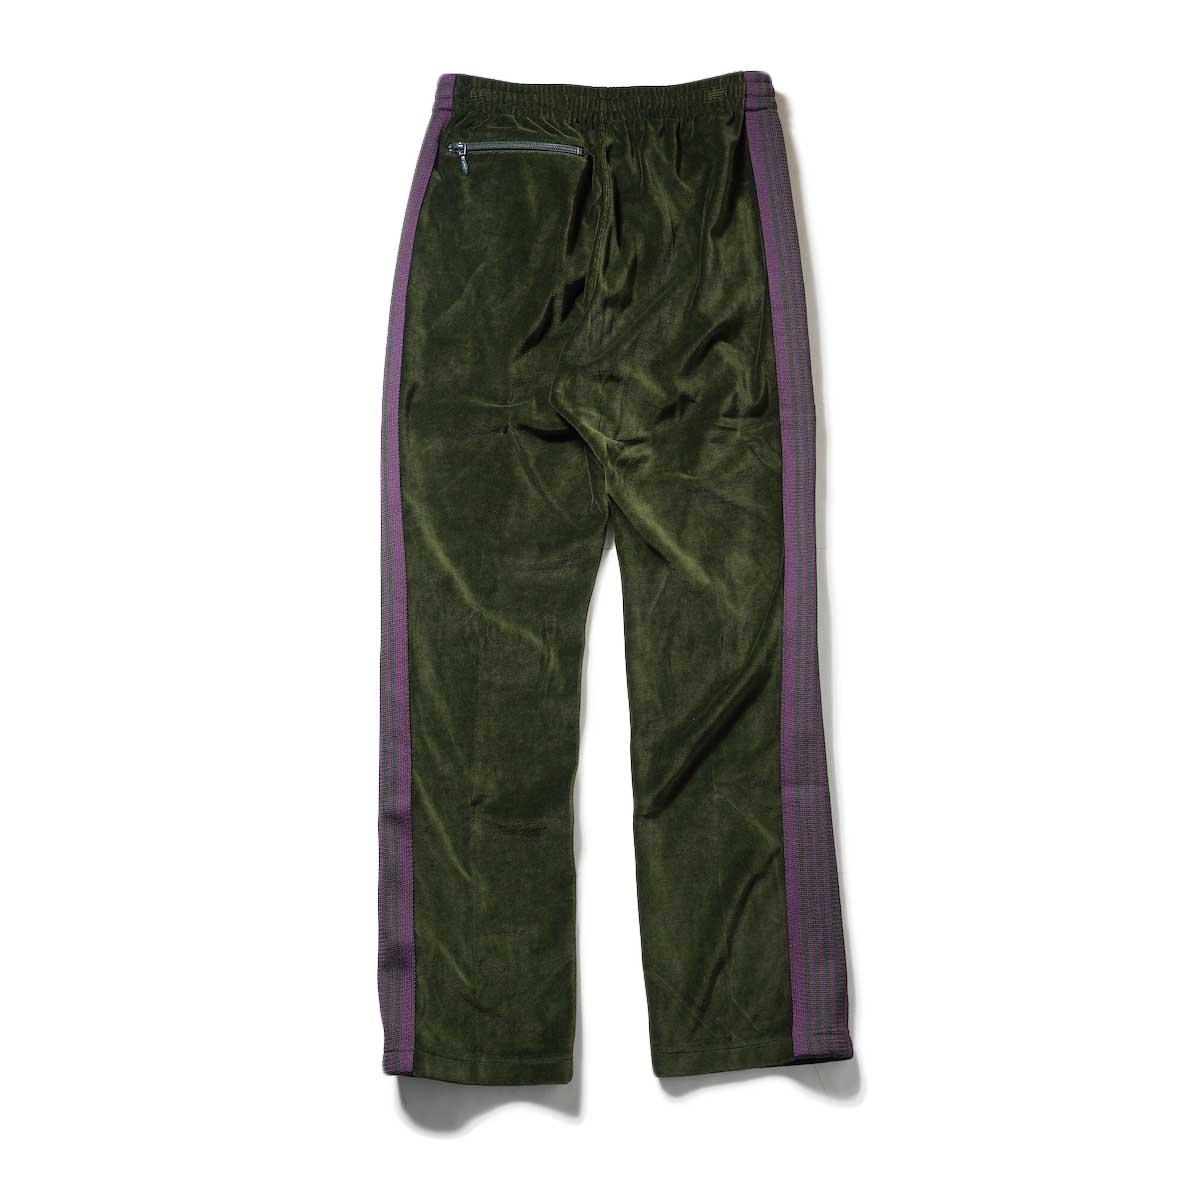 Needles / NARROW TRACK PANT - C/PE VELOUR (Green)背面